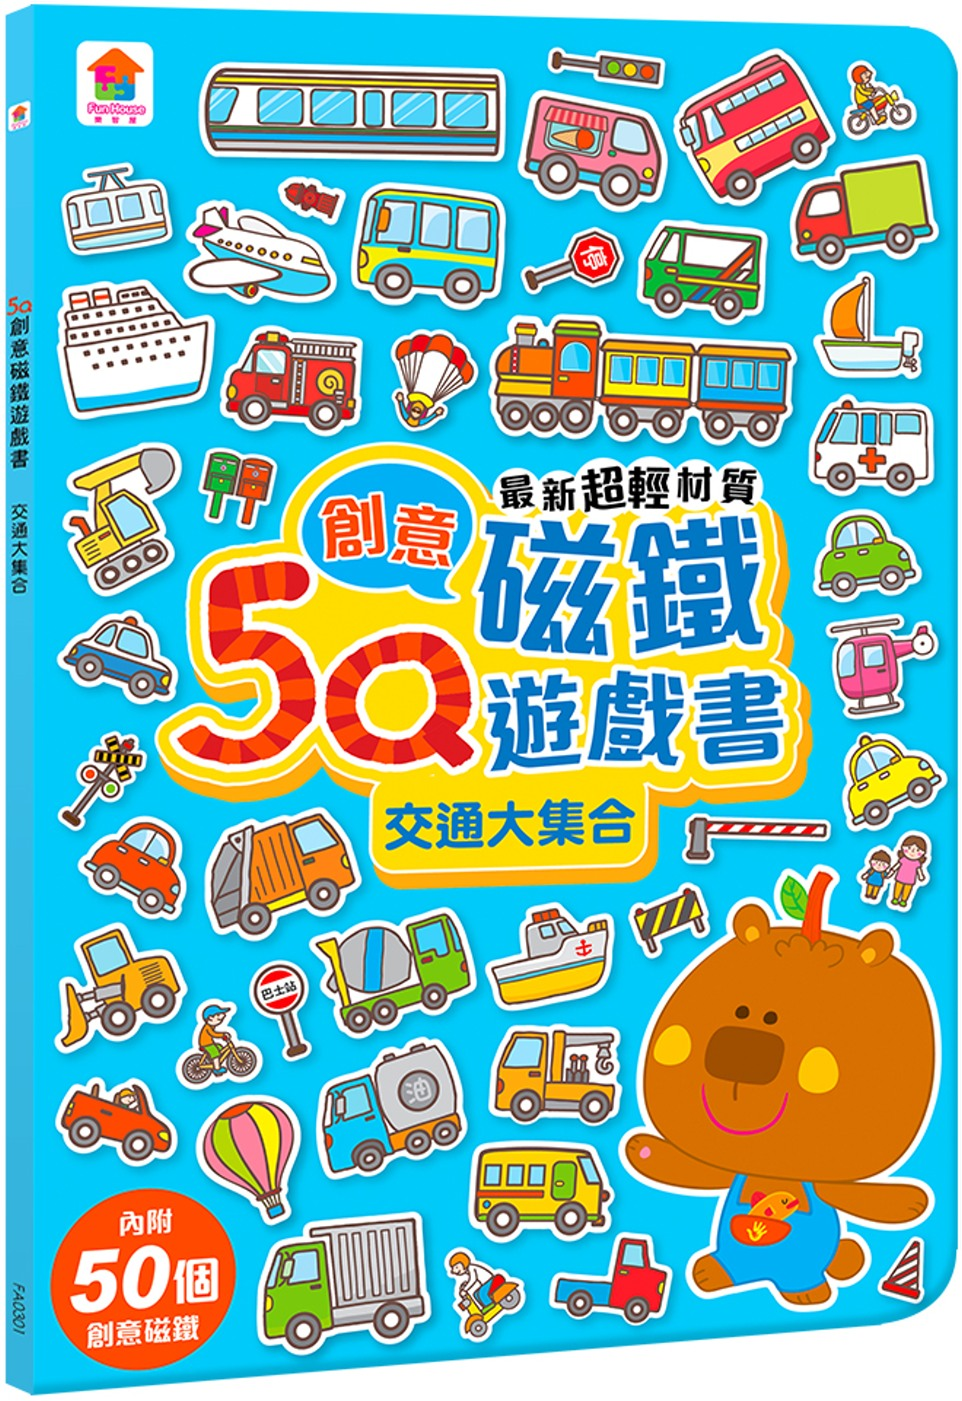 5Q創意磁鐵遊戲書:交通大集合(內附50個創意磁鐵+1個趣味大場景)